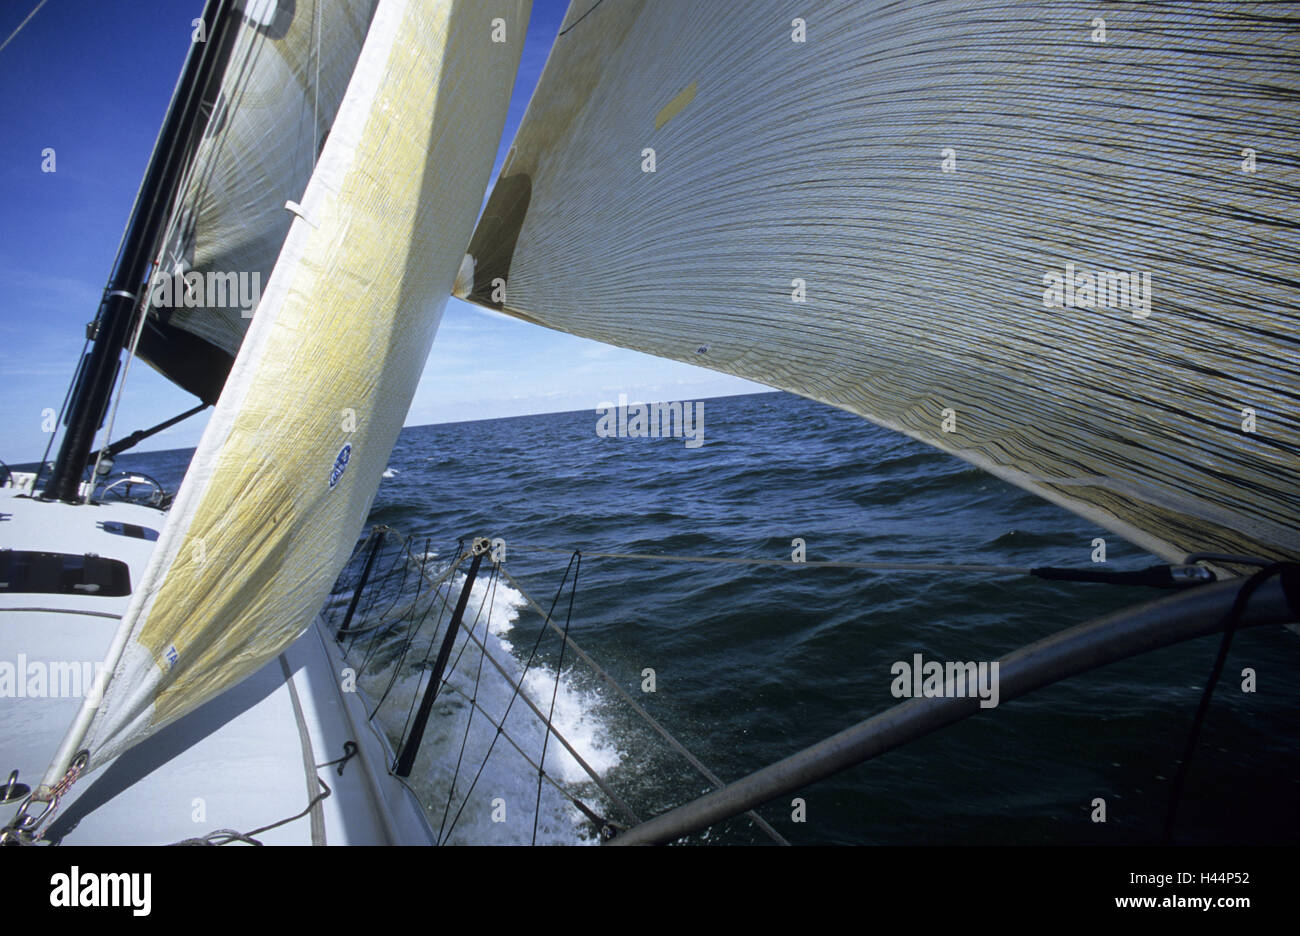 Sail yacht, sail, wind, sailing ship, yacht, sailboats, boat, sailings, water sport, sport, sailing trip, regatta, - Stock Image